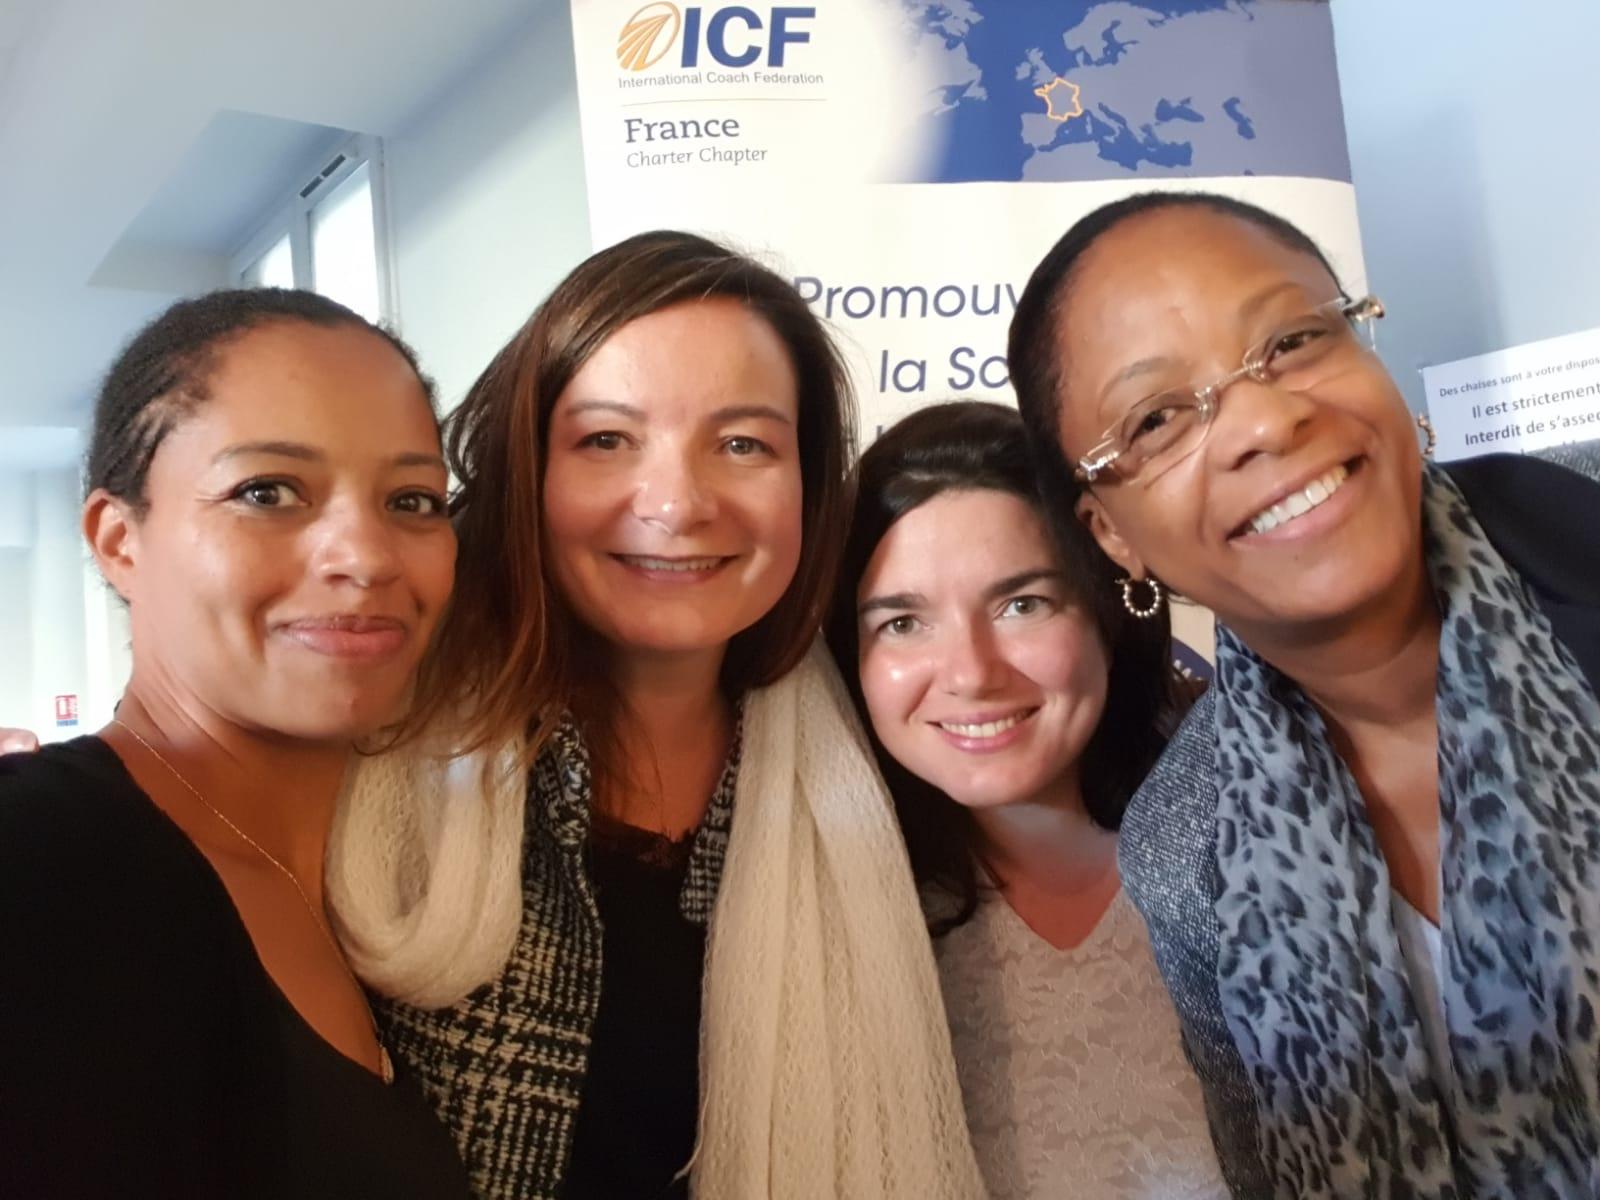 ICF-Cafe-Coach-2018-09-24-2